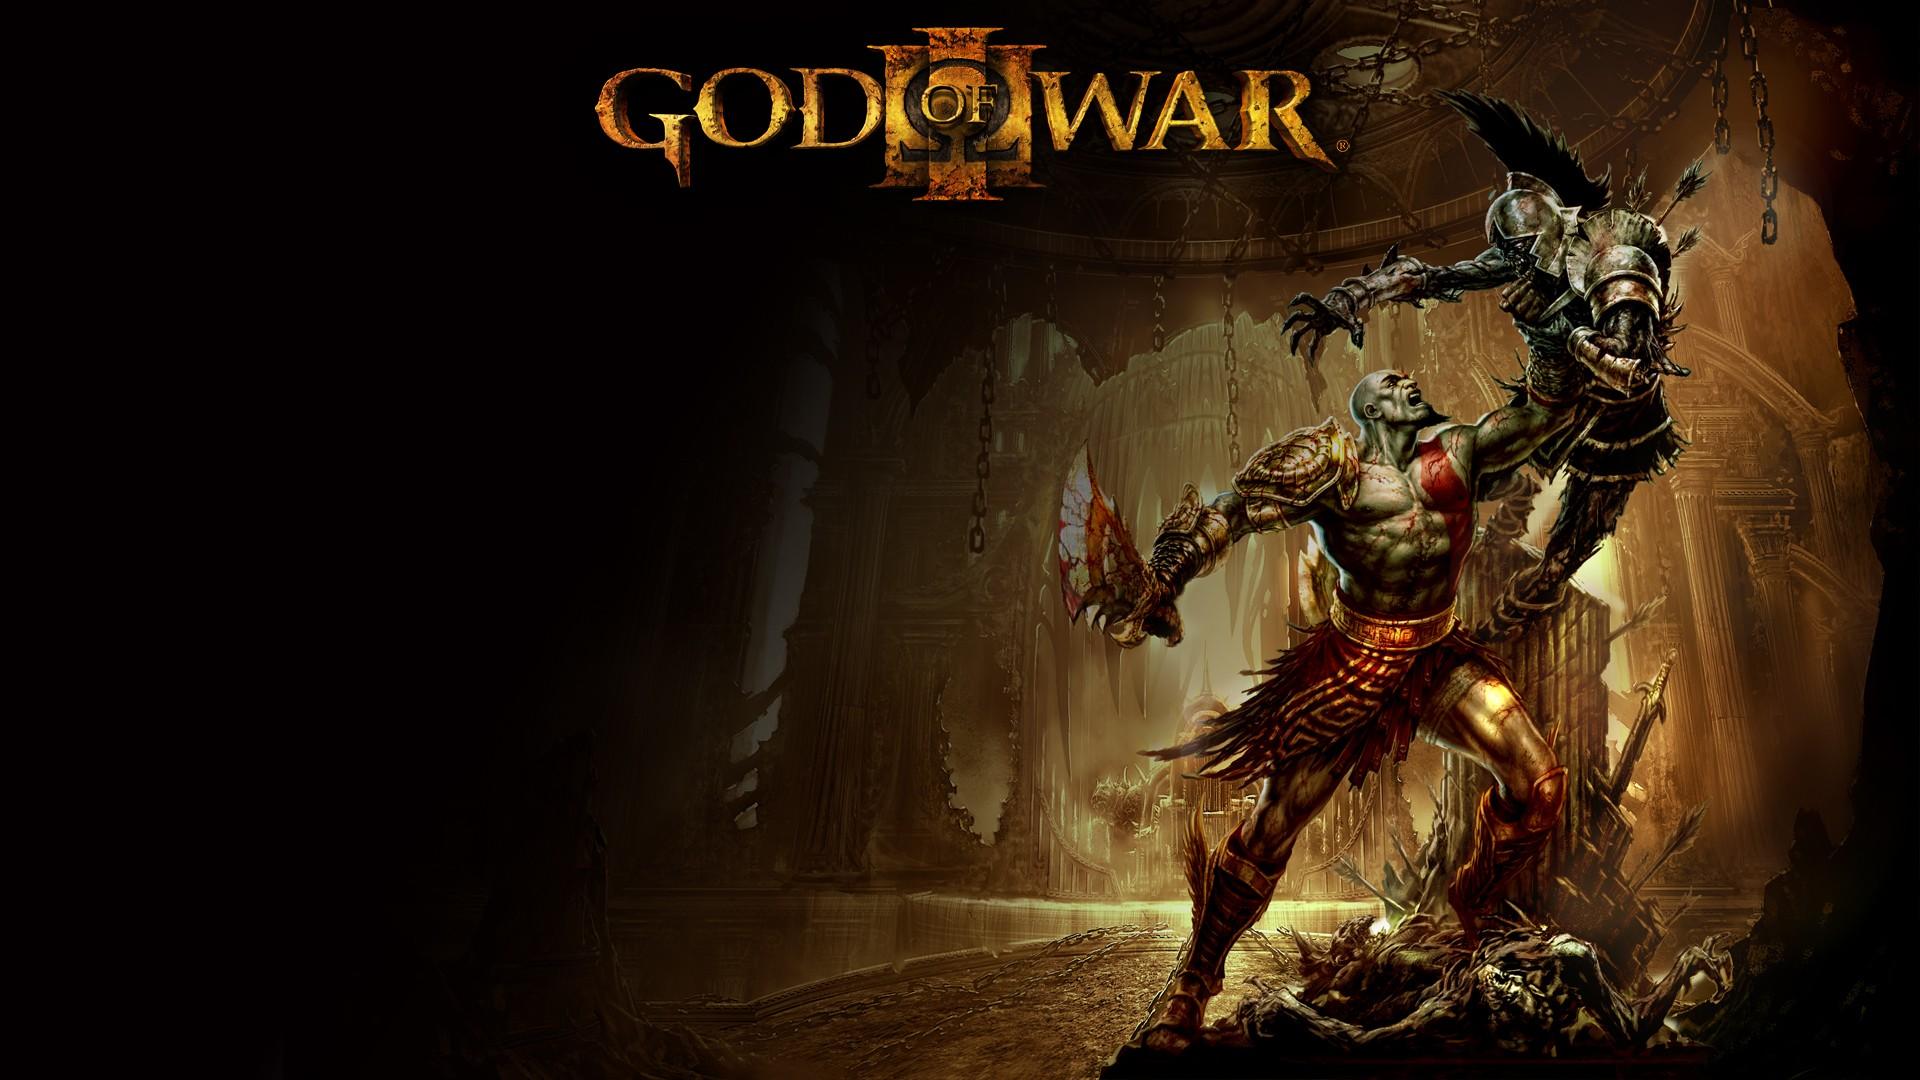 Wallpaper Mythology God Of War Iii Darkness Screenshot